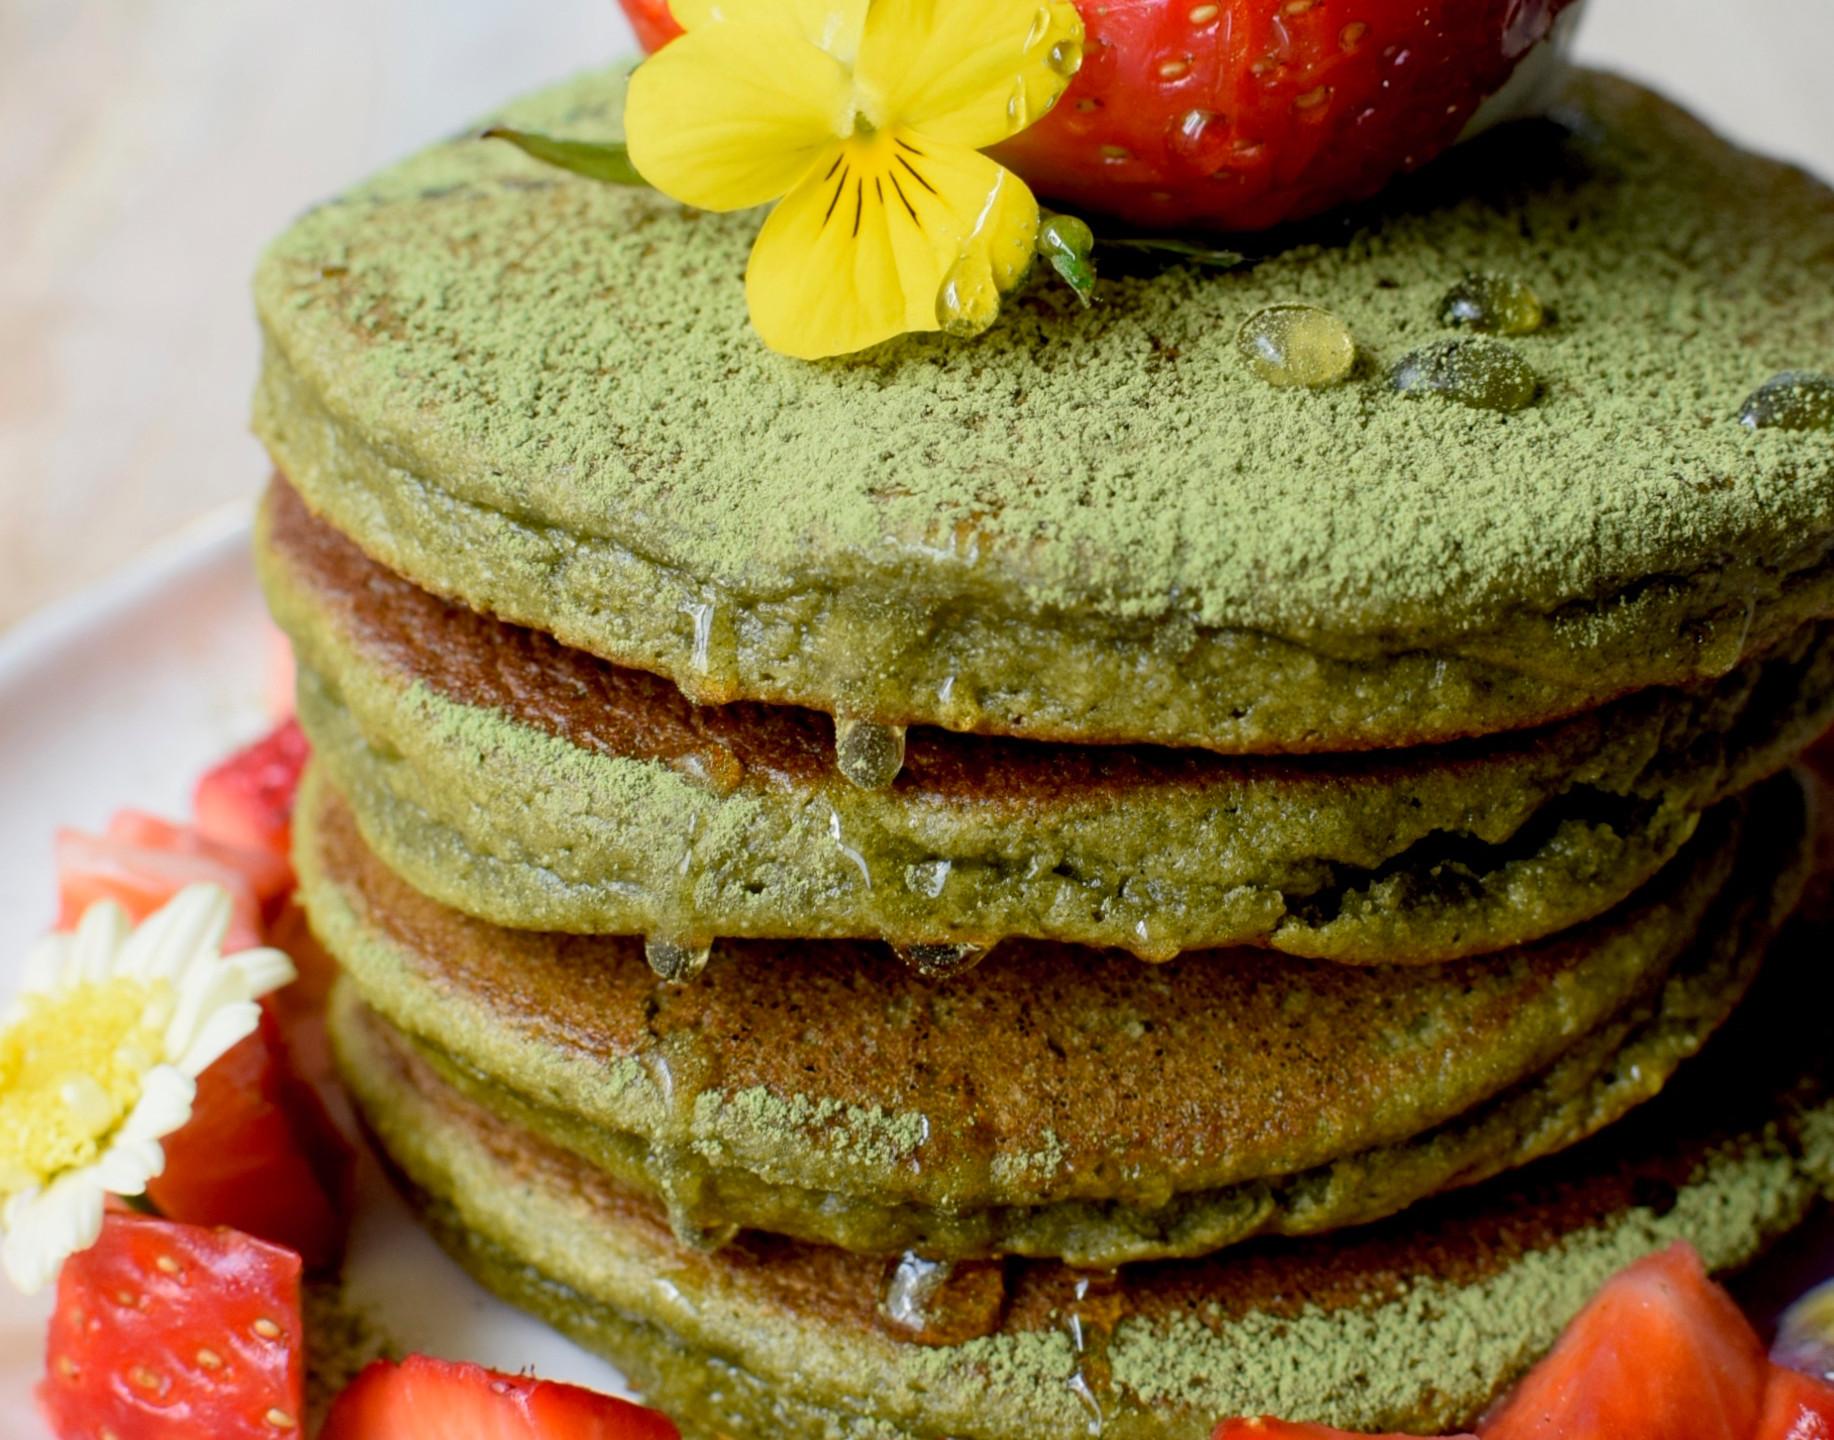 Green coloured pancakes